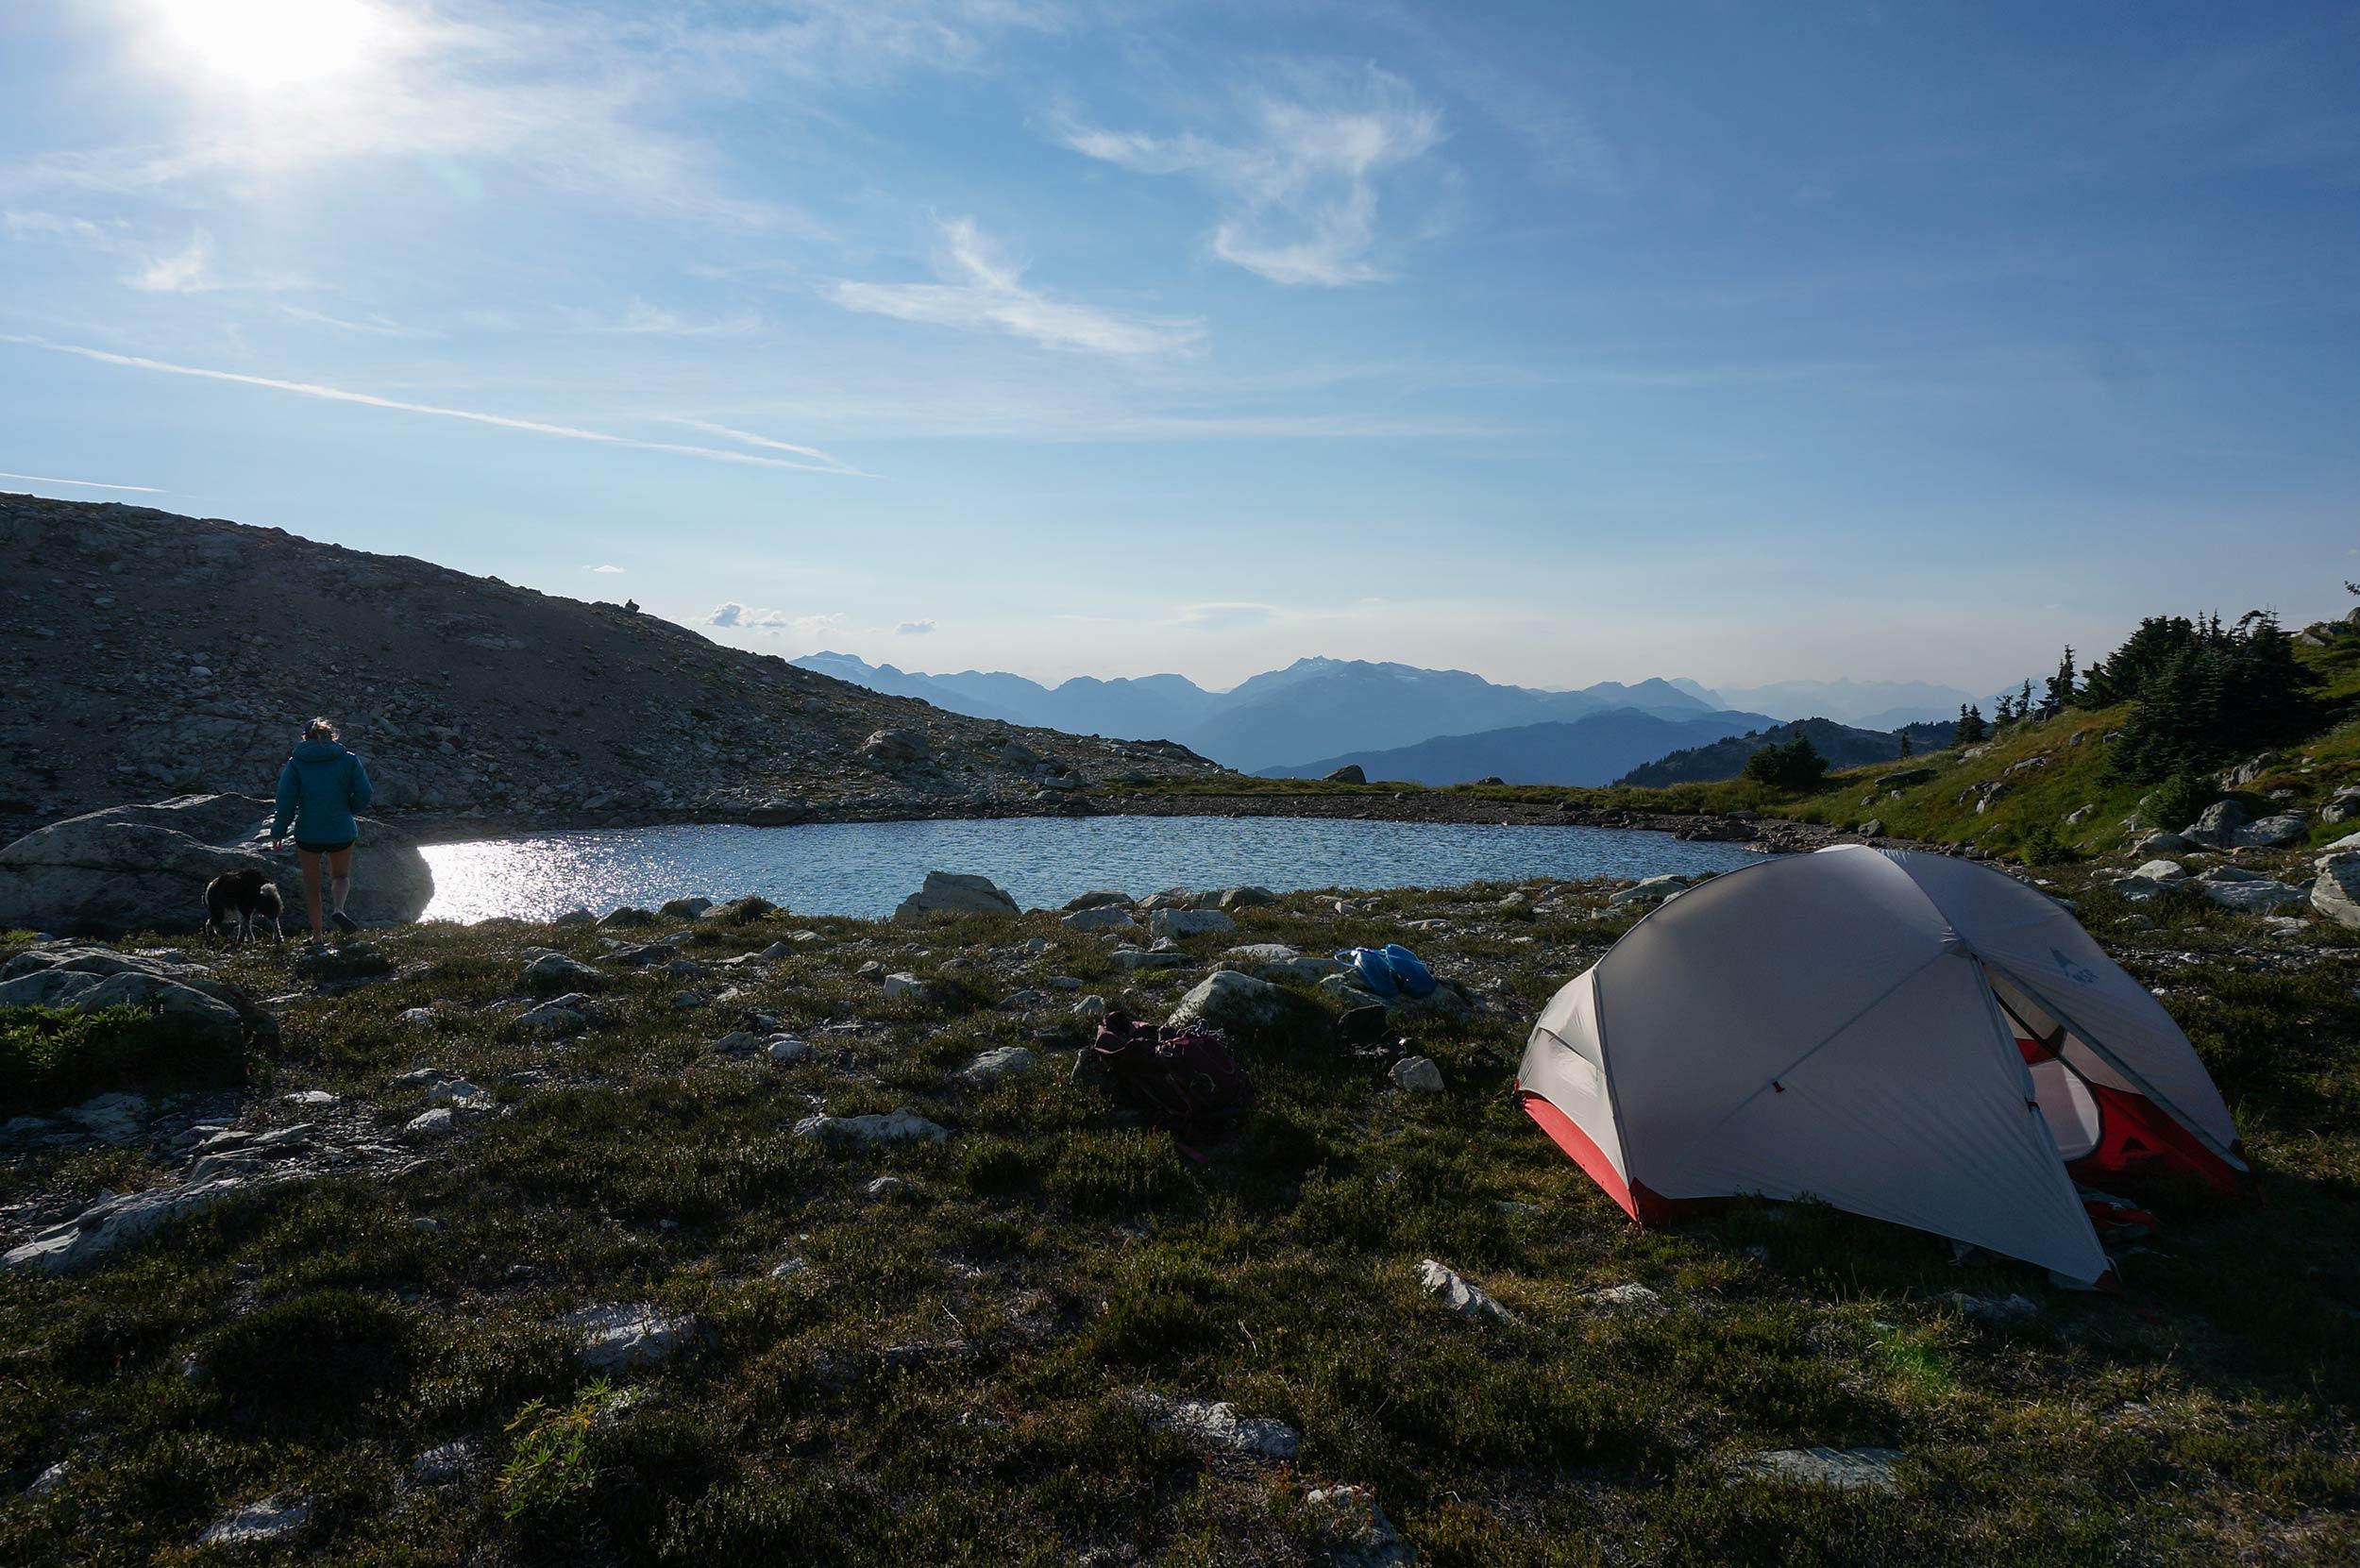 sproatt_alpine_trail_candice_nugget_msr_camping.jpg